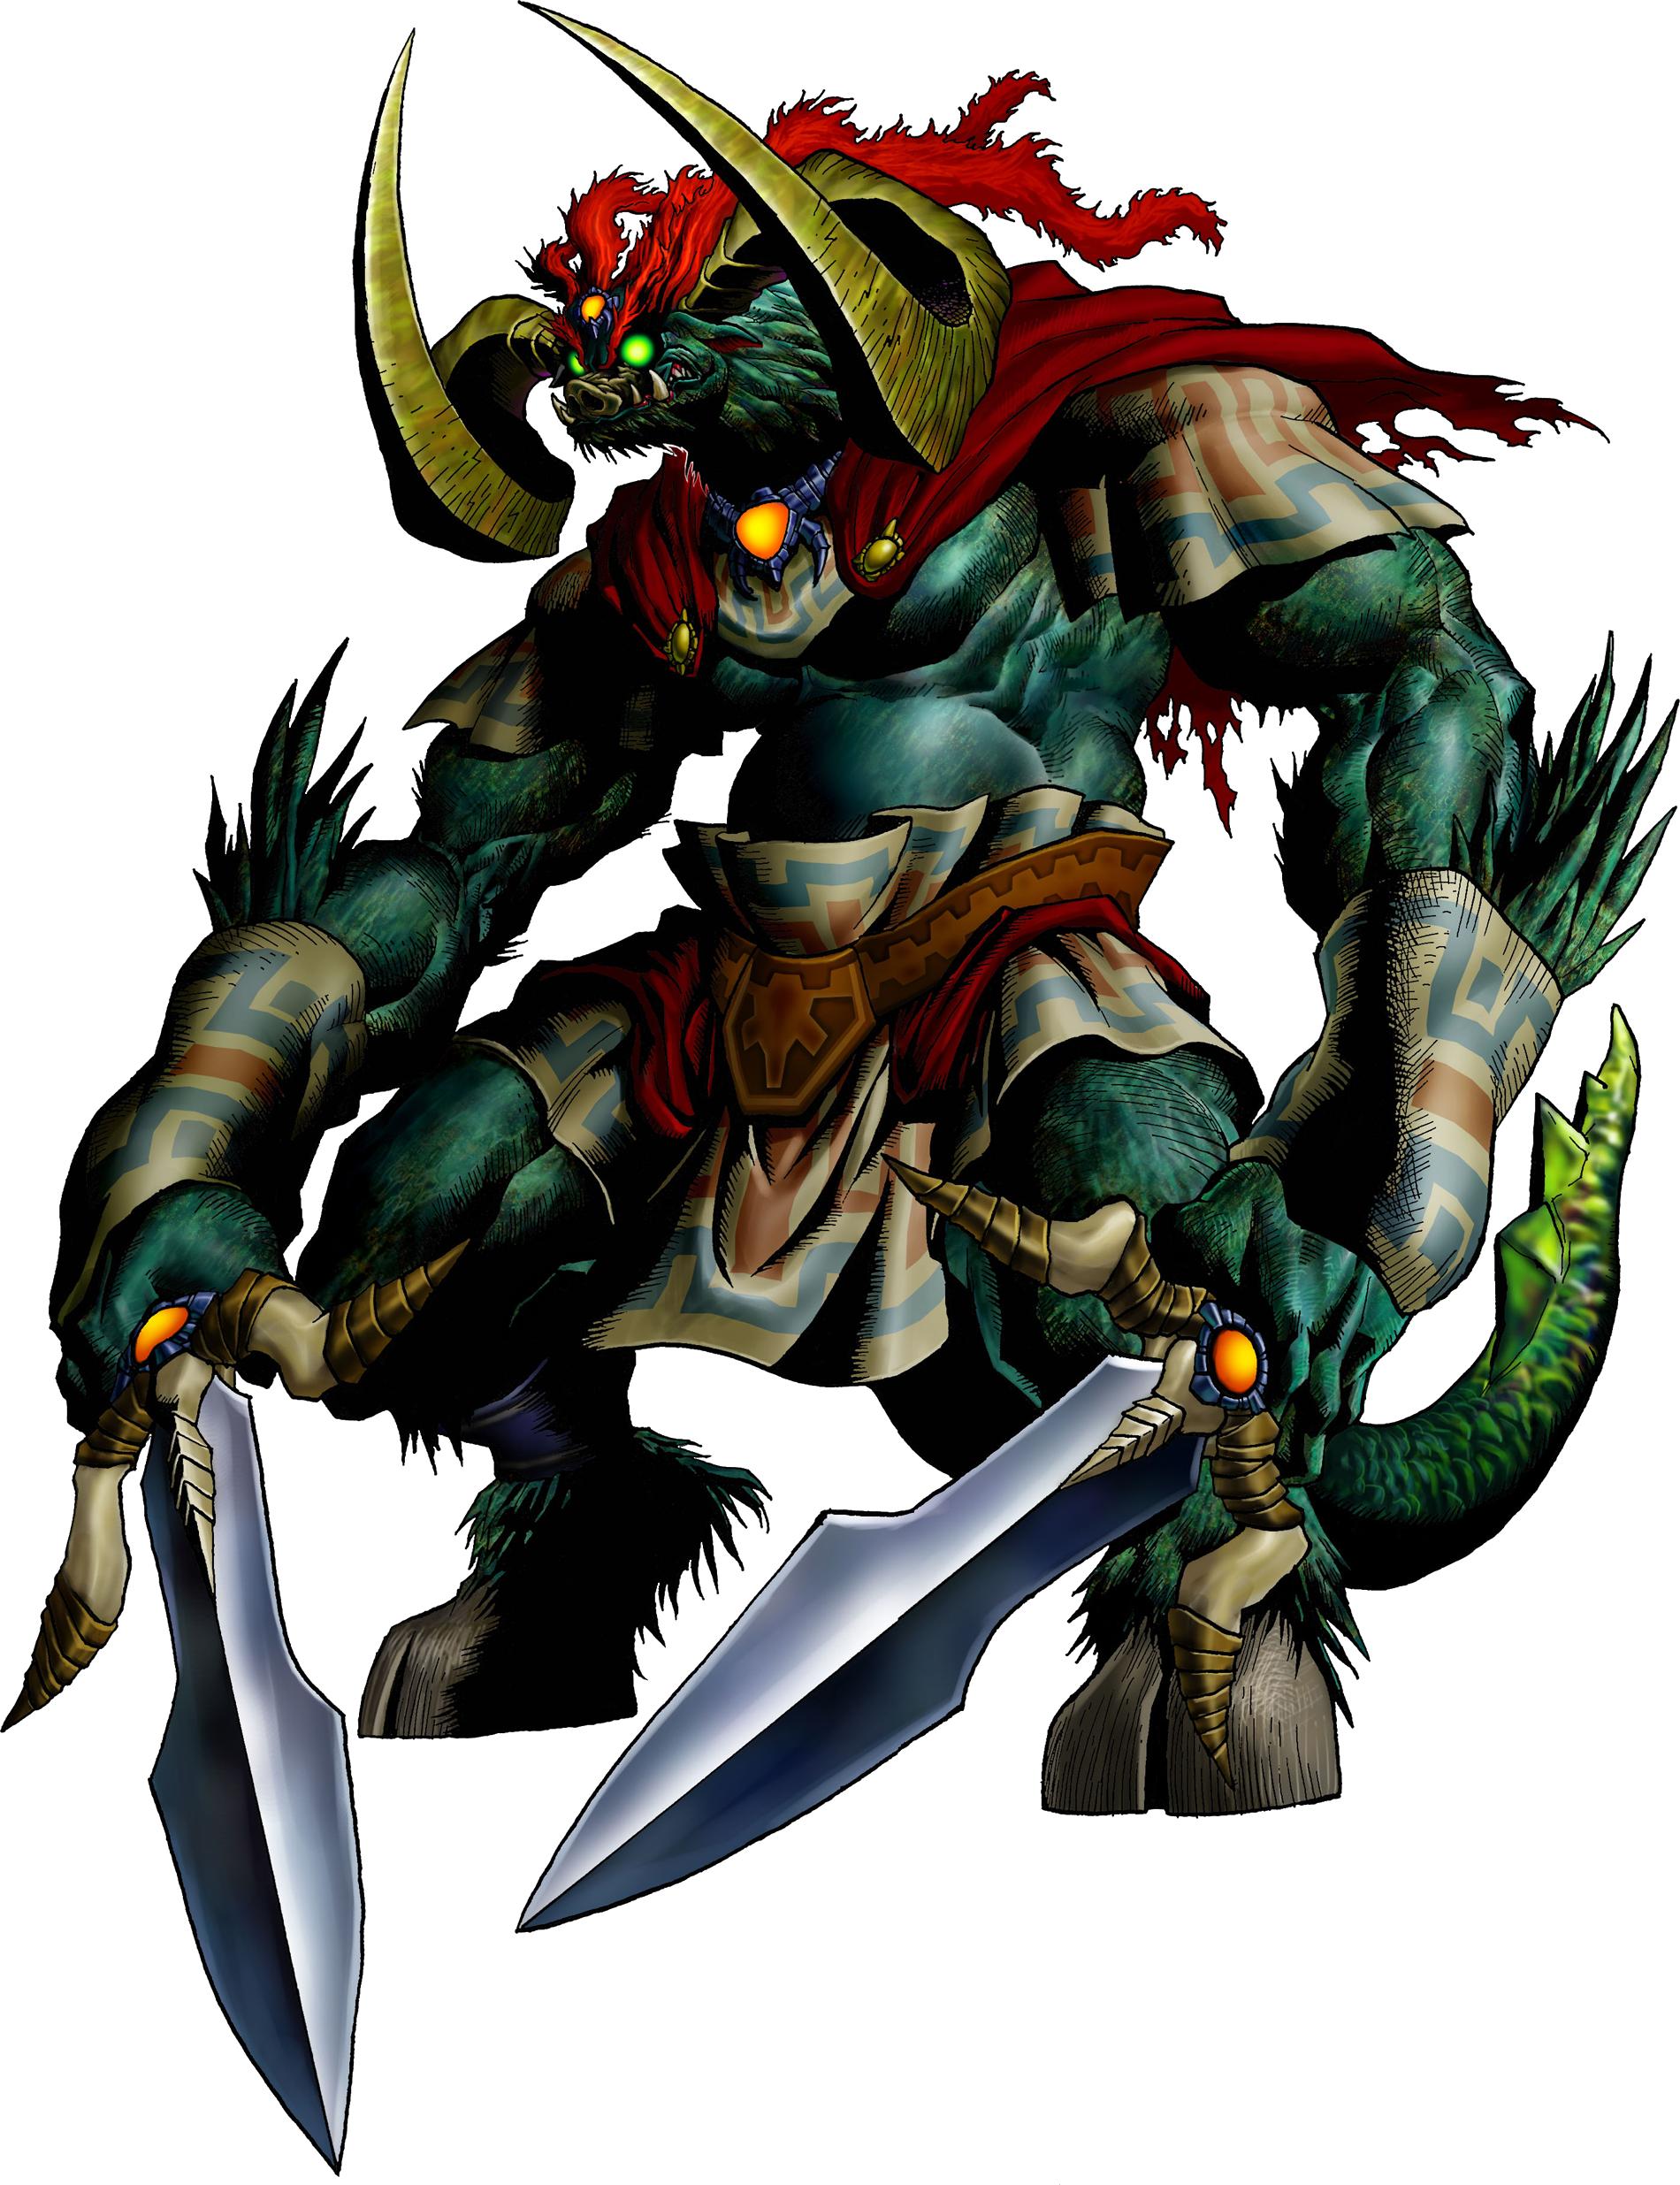 Ganon (Ocarina of Time) | Zeldapedia | Fandom